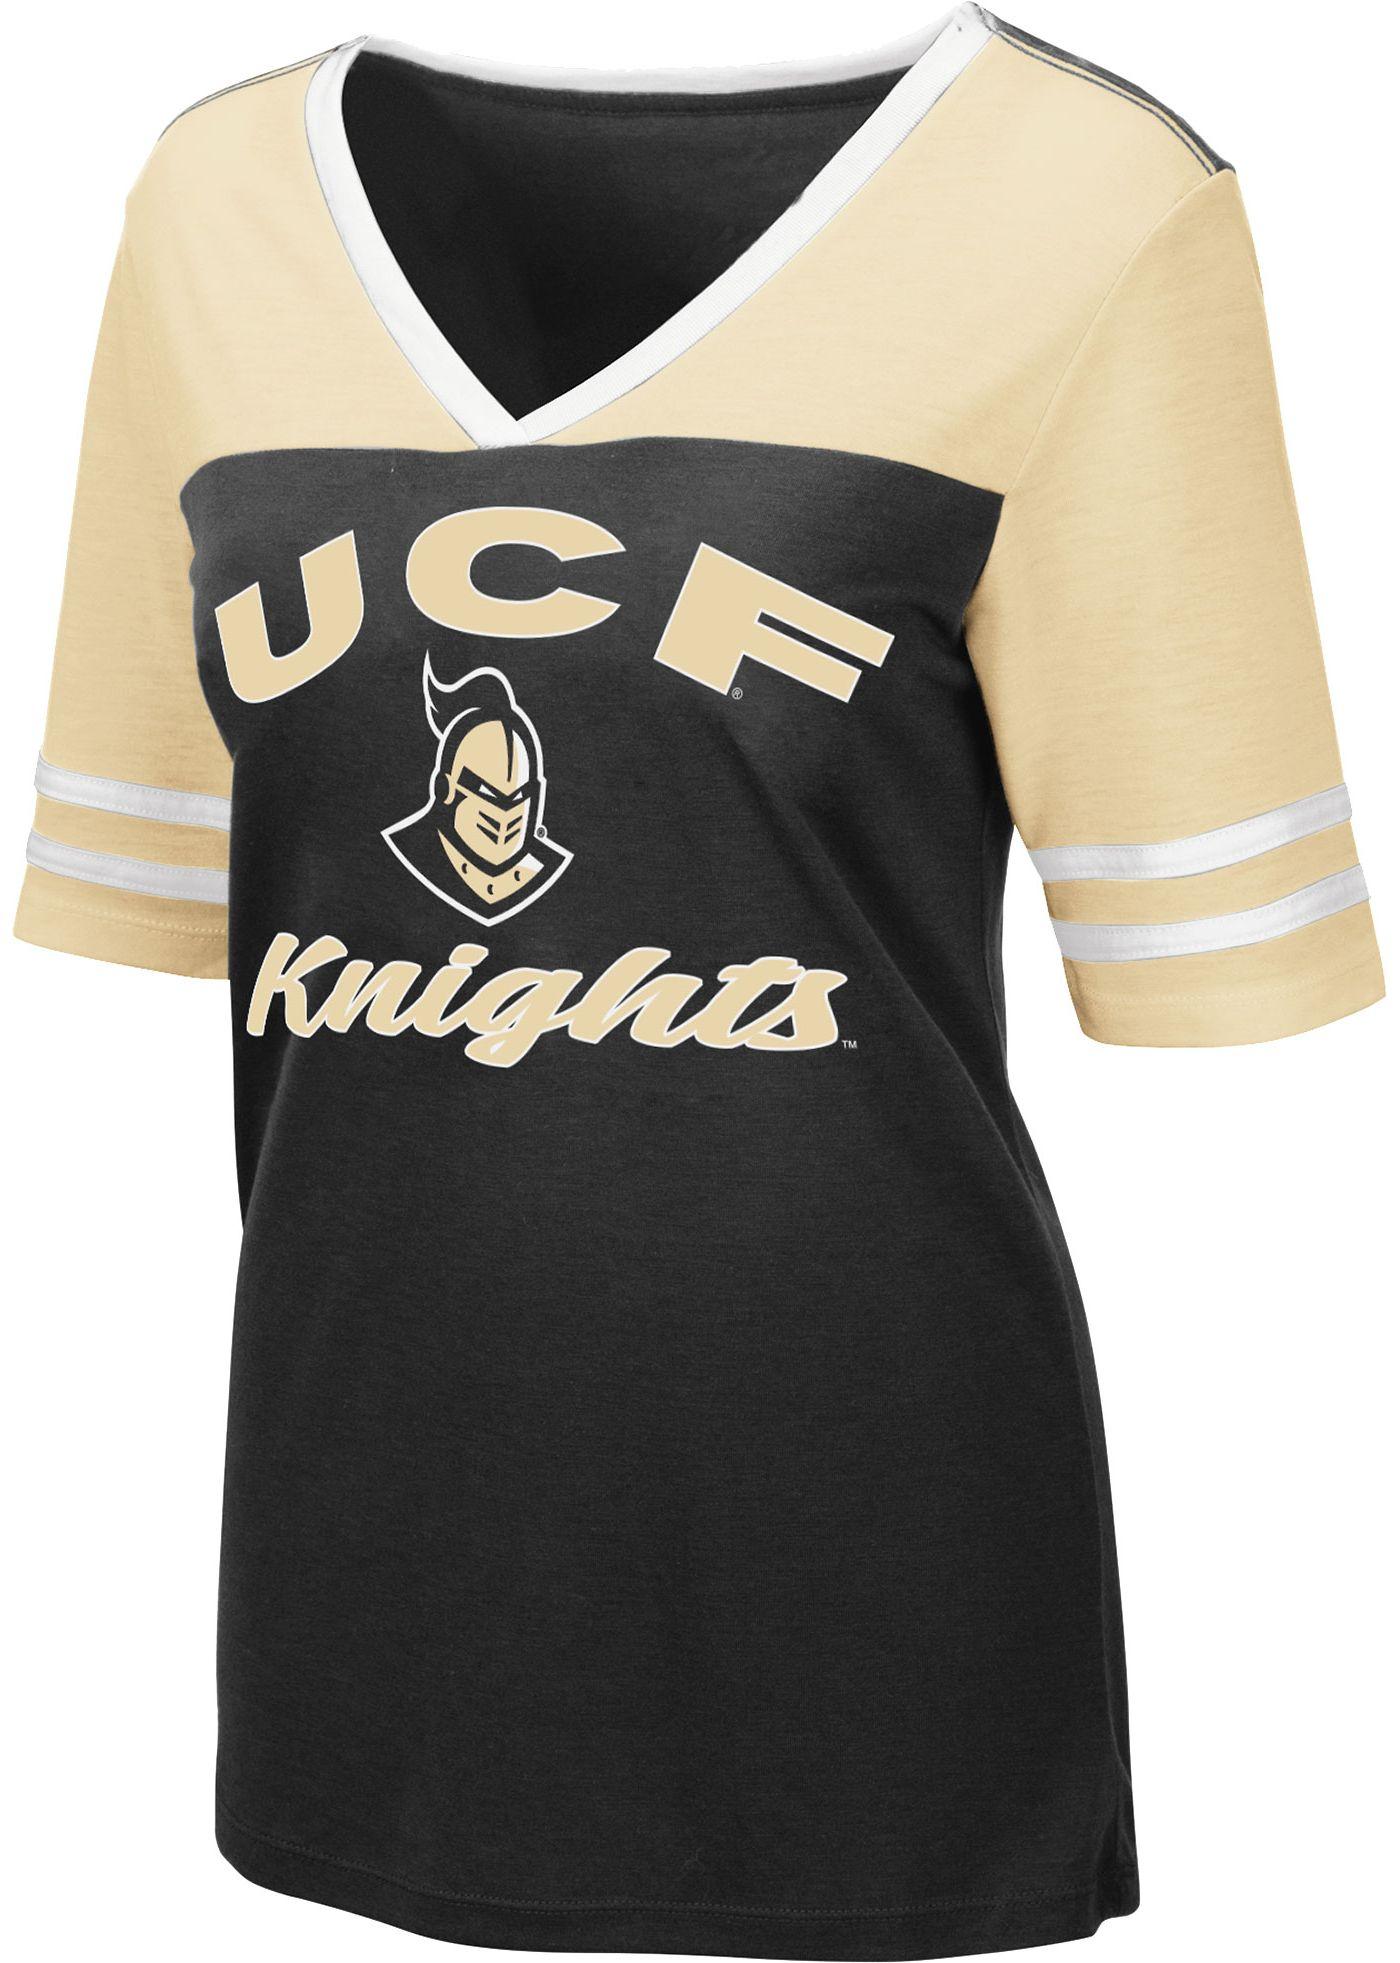 Colosseum Women's UCF Knights Samantha Black T-Shirt